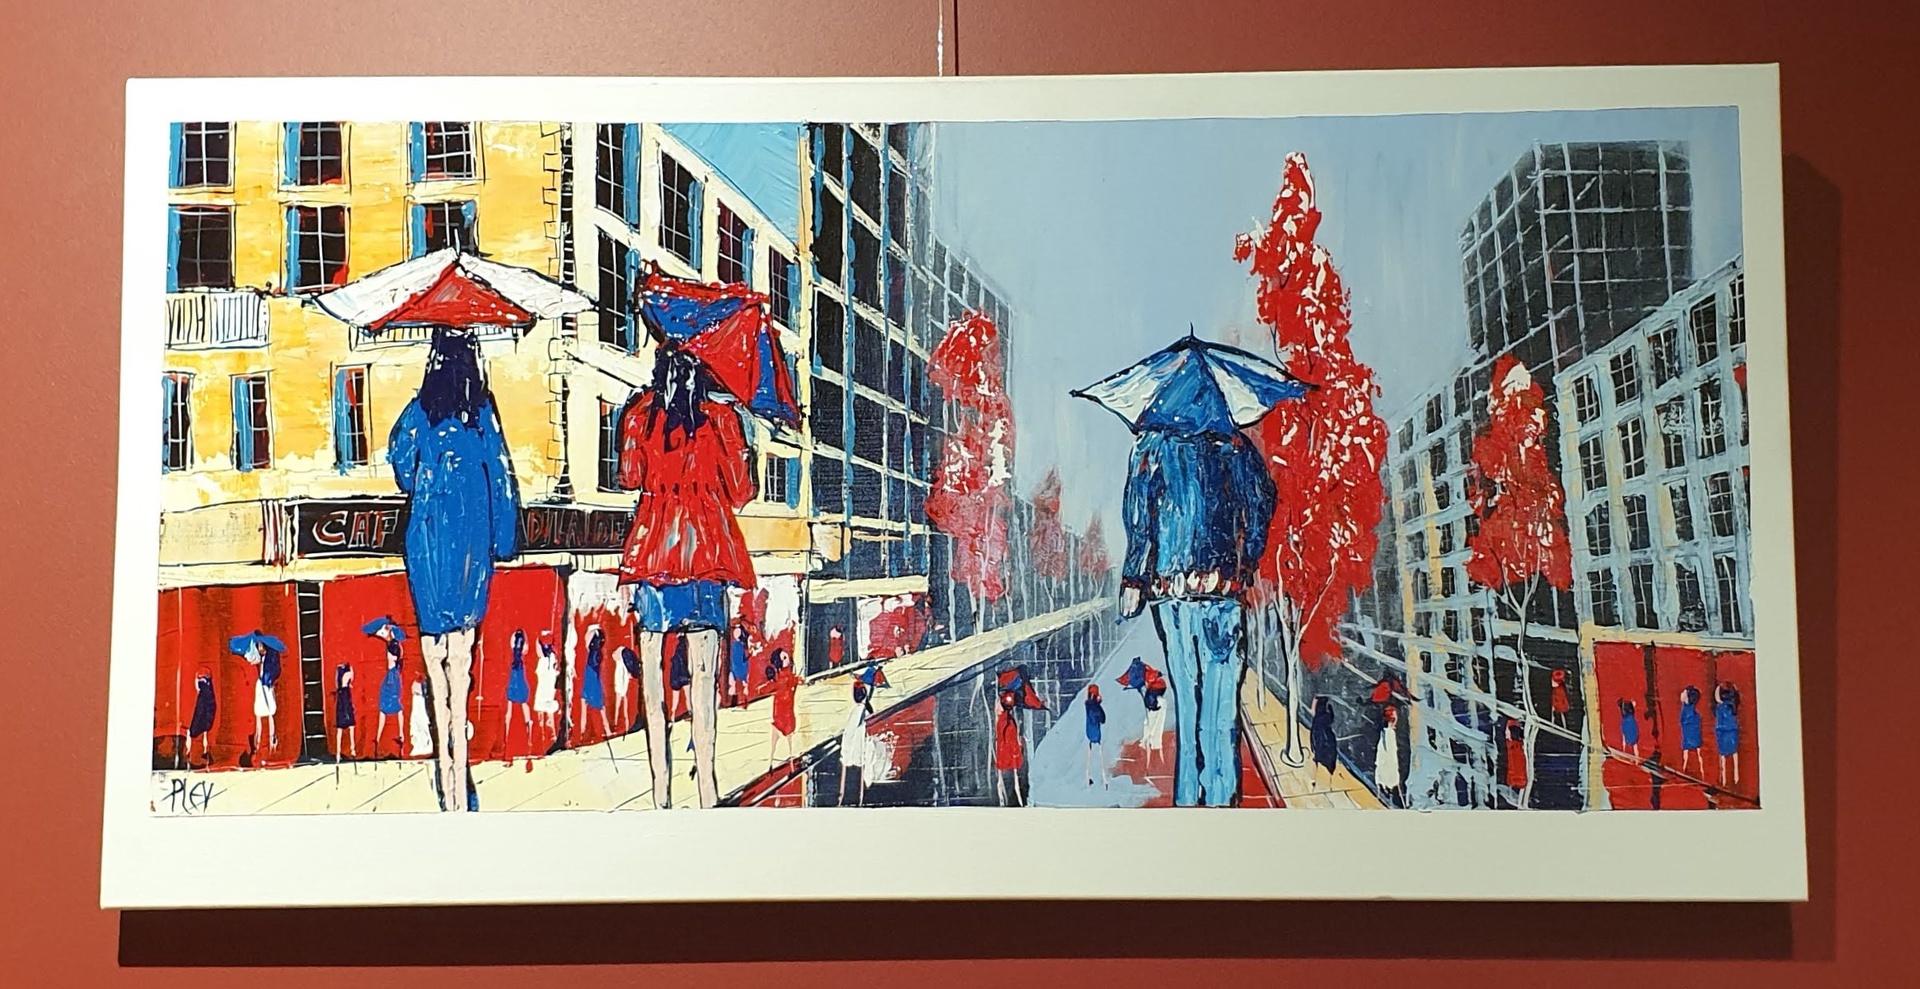 Raining in the city - Acrylic on canvas